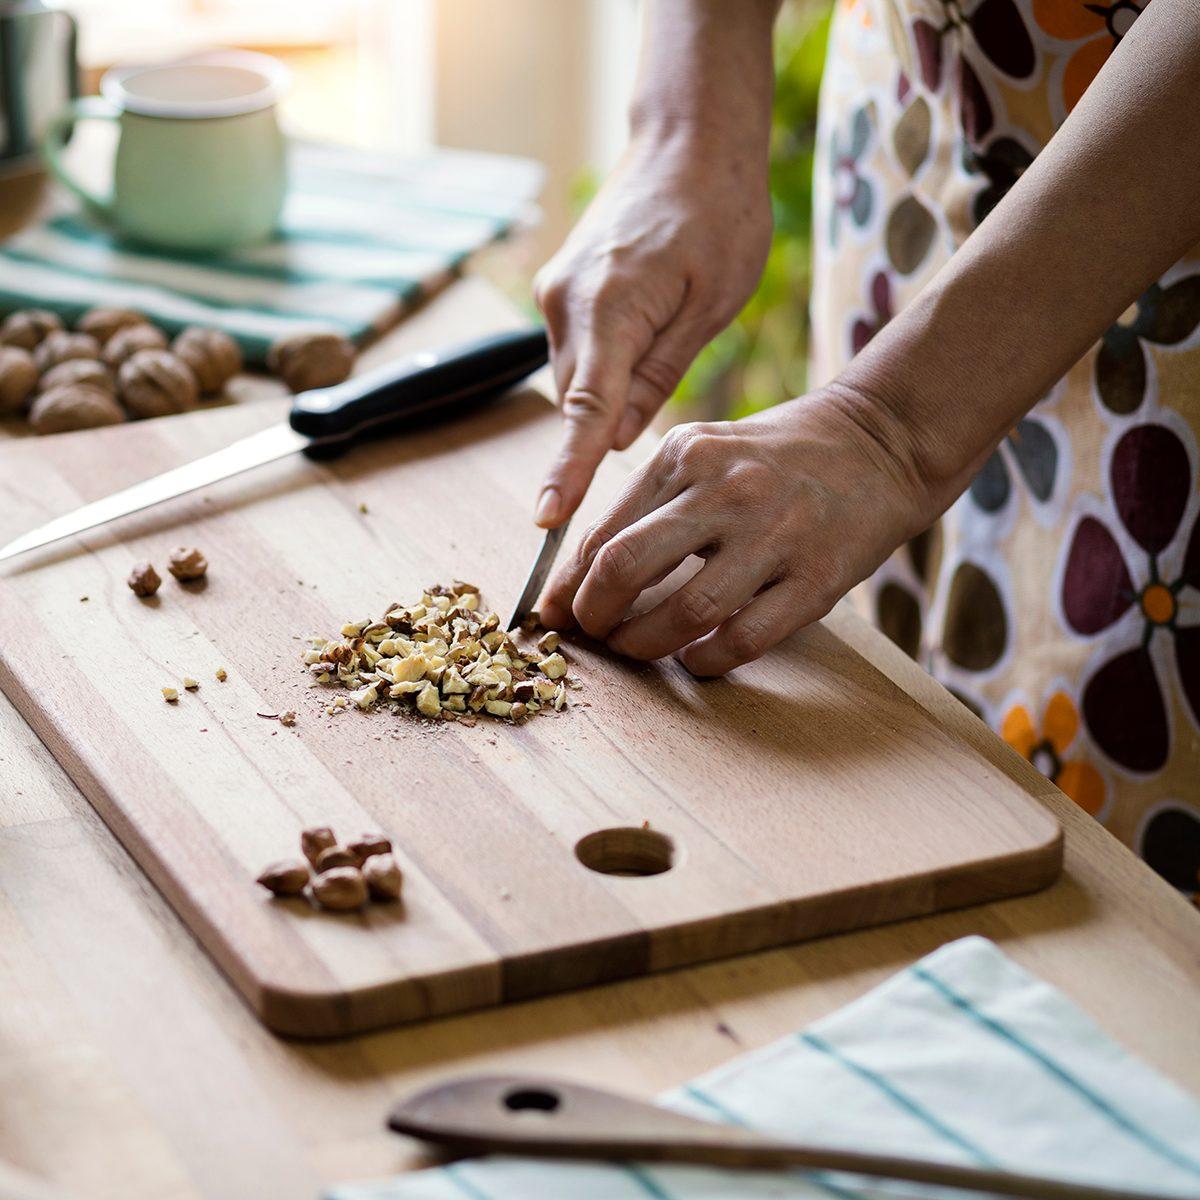 Preparing cookies in domestic kitchen